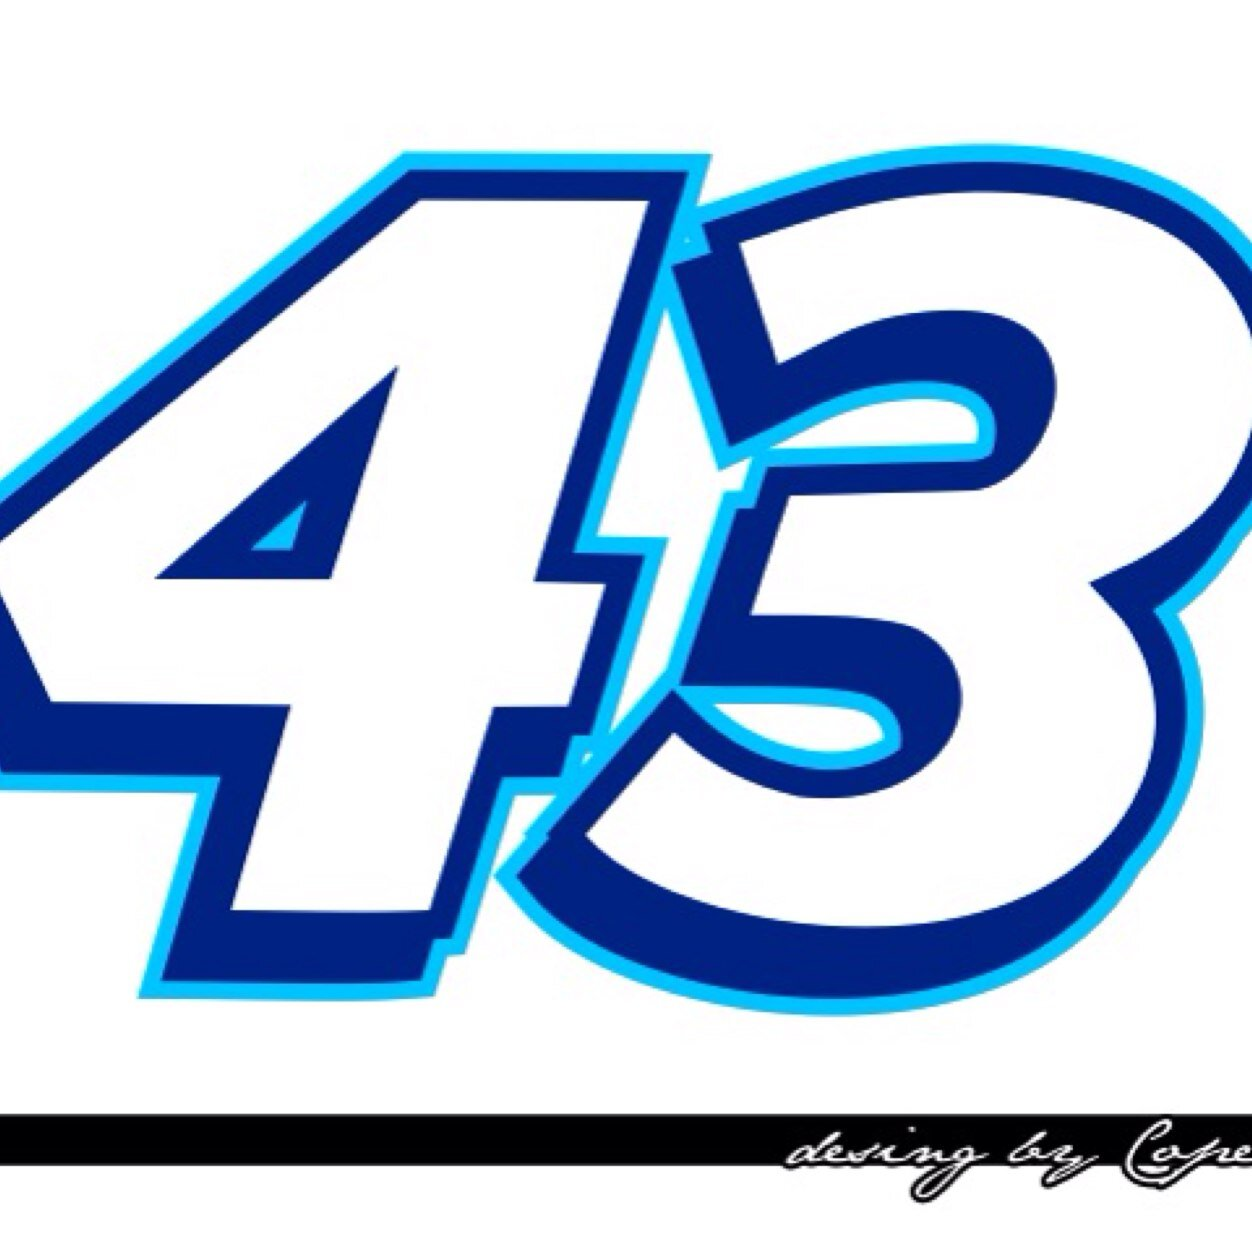 ���������� ��� ������������� ���� ��-43 ��� ������